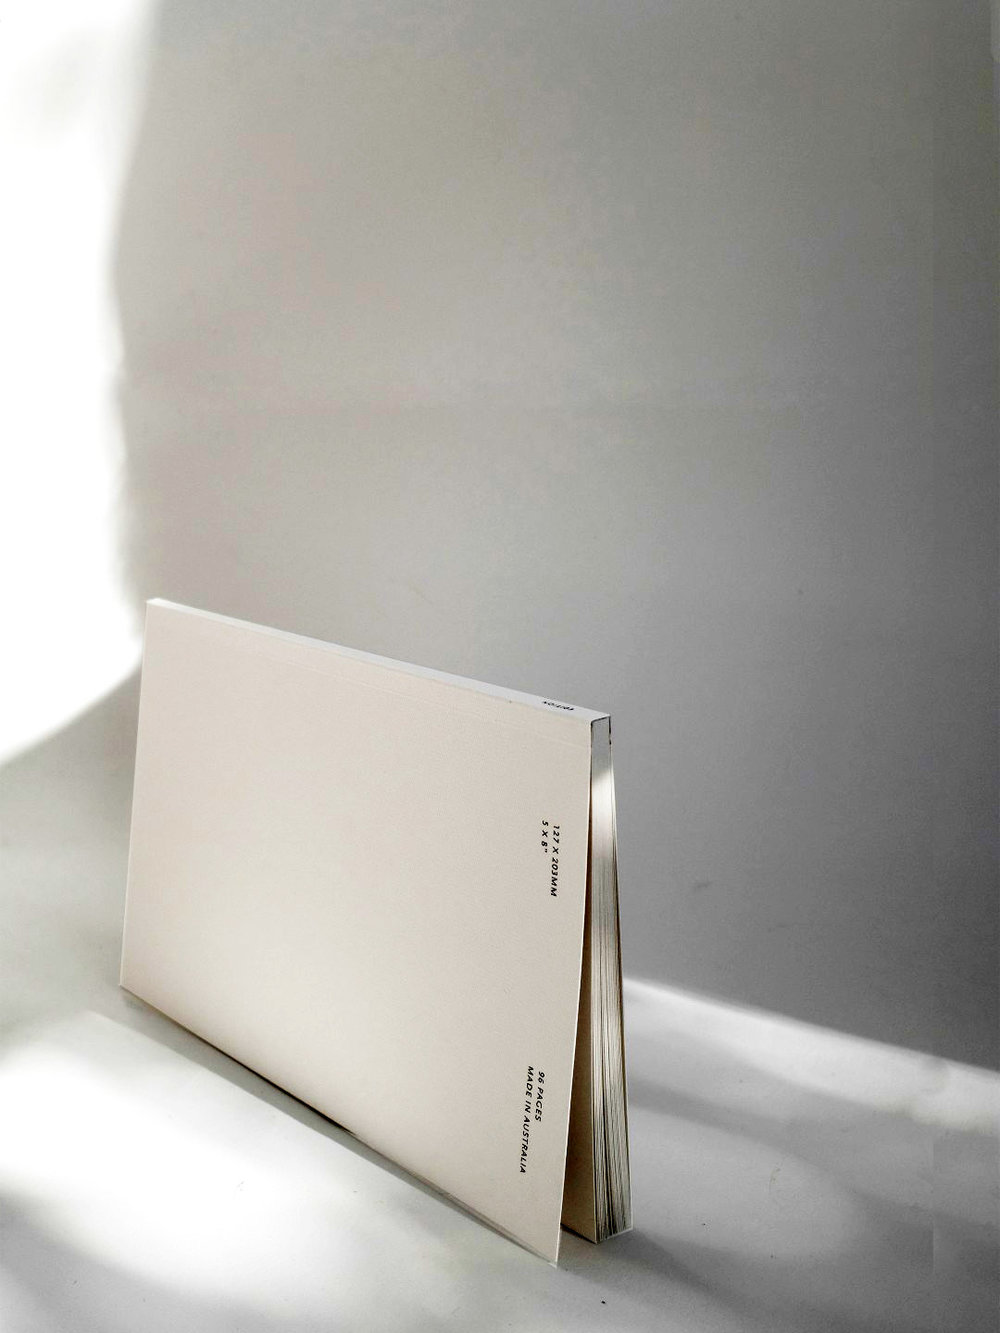 standard-cahier-2-uai-1080x1440.jpg